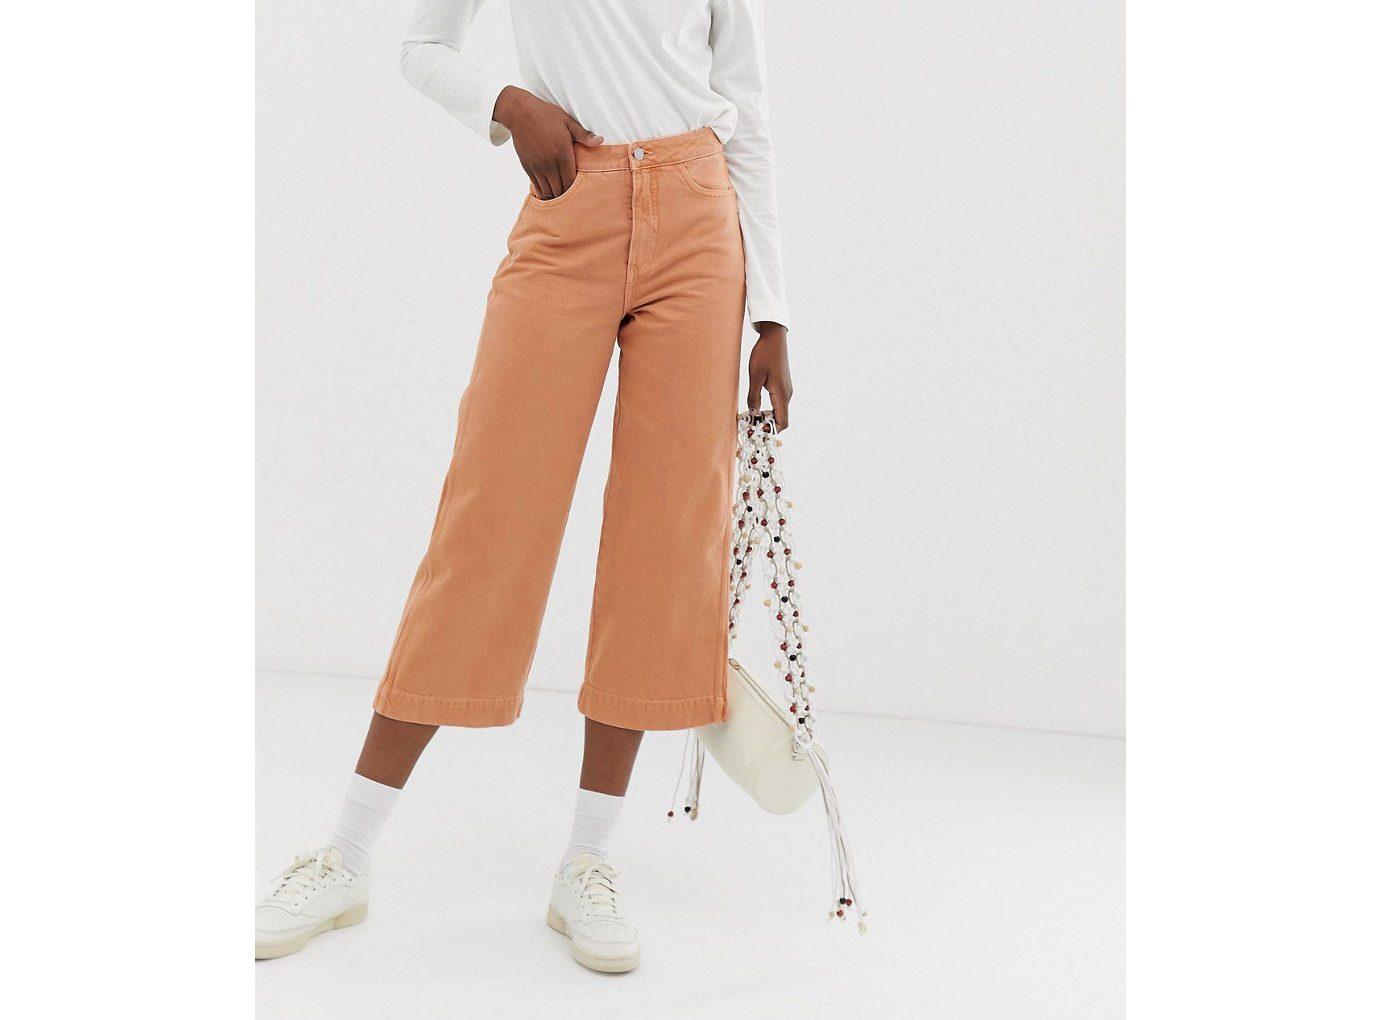 Weekday Denim Wide Leg Jeans in Tangerine